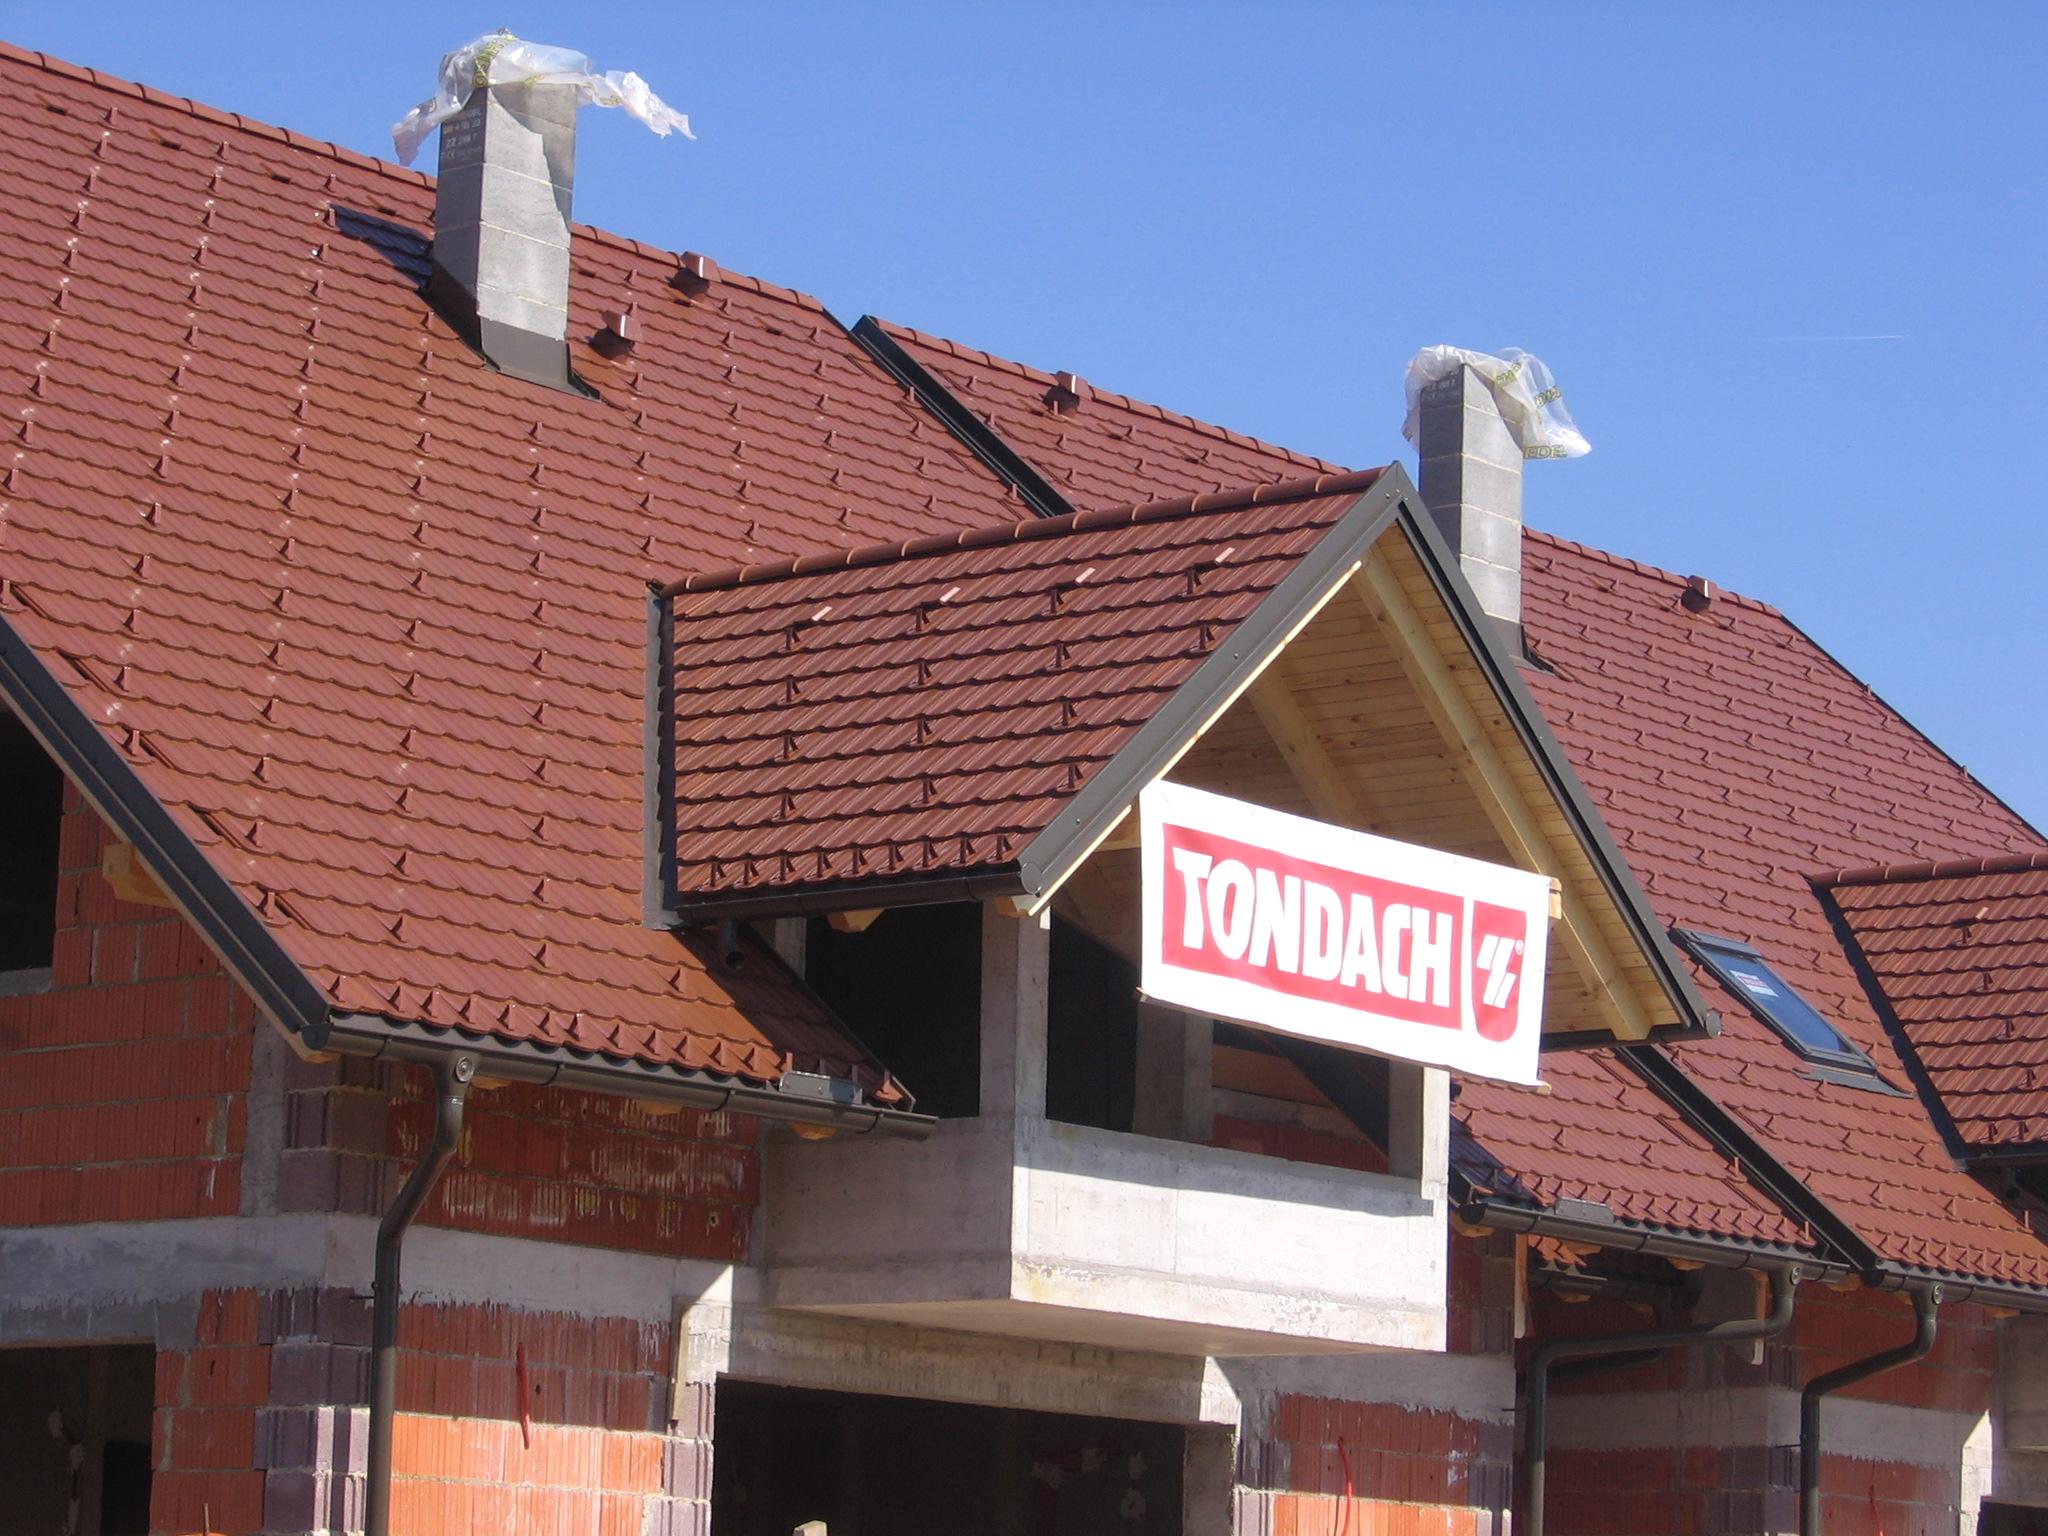 KROVSTVO - TONDACH